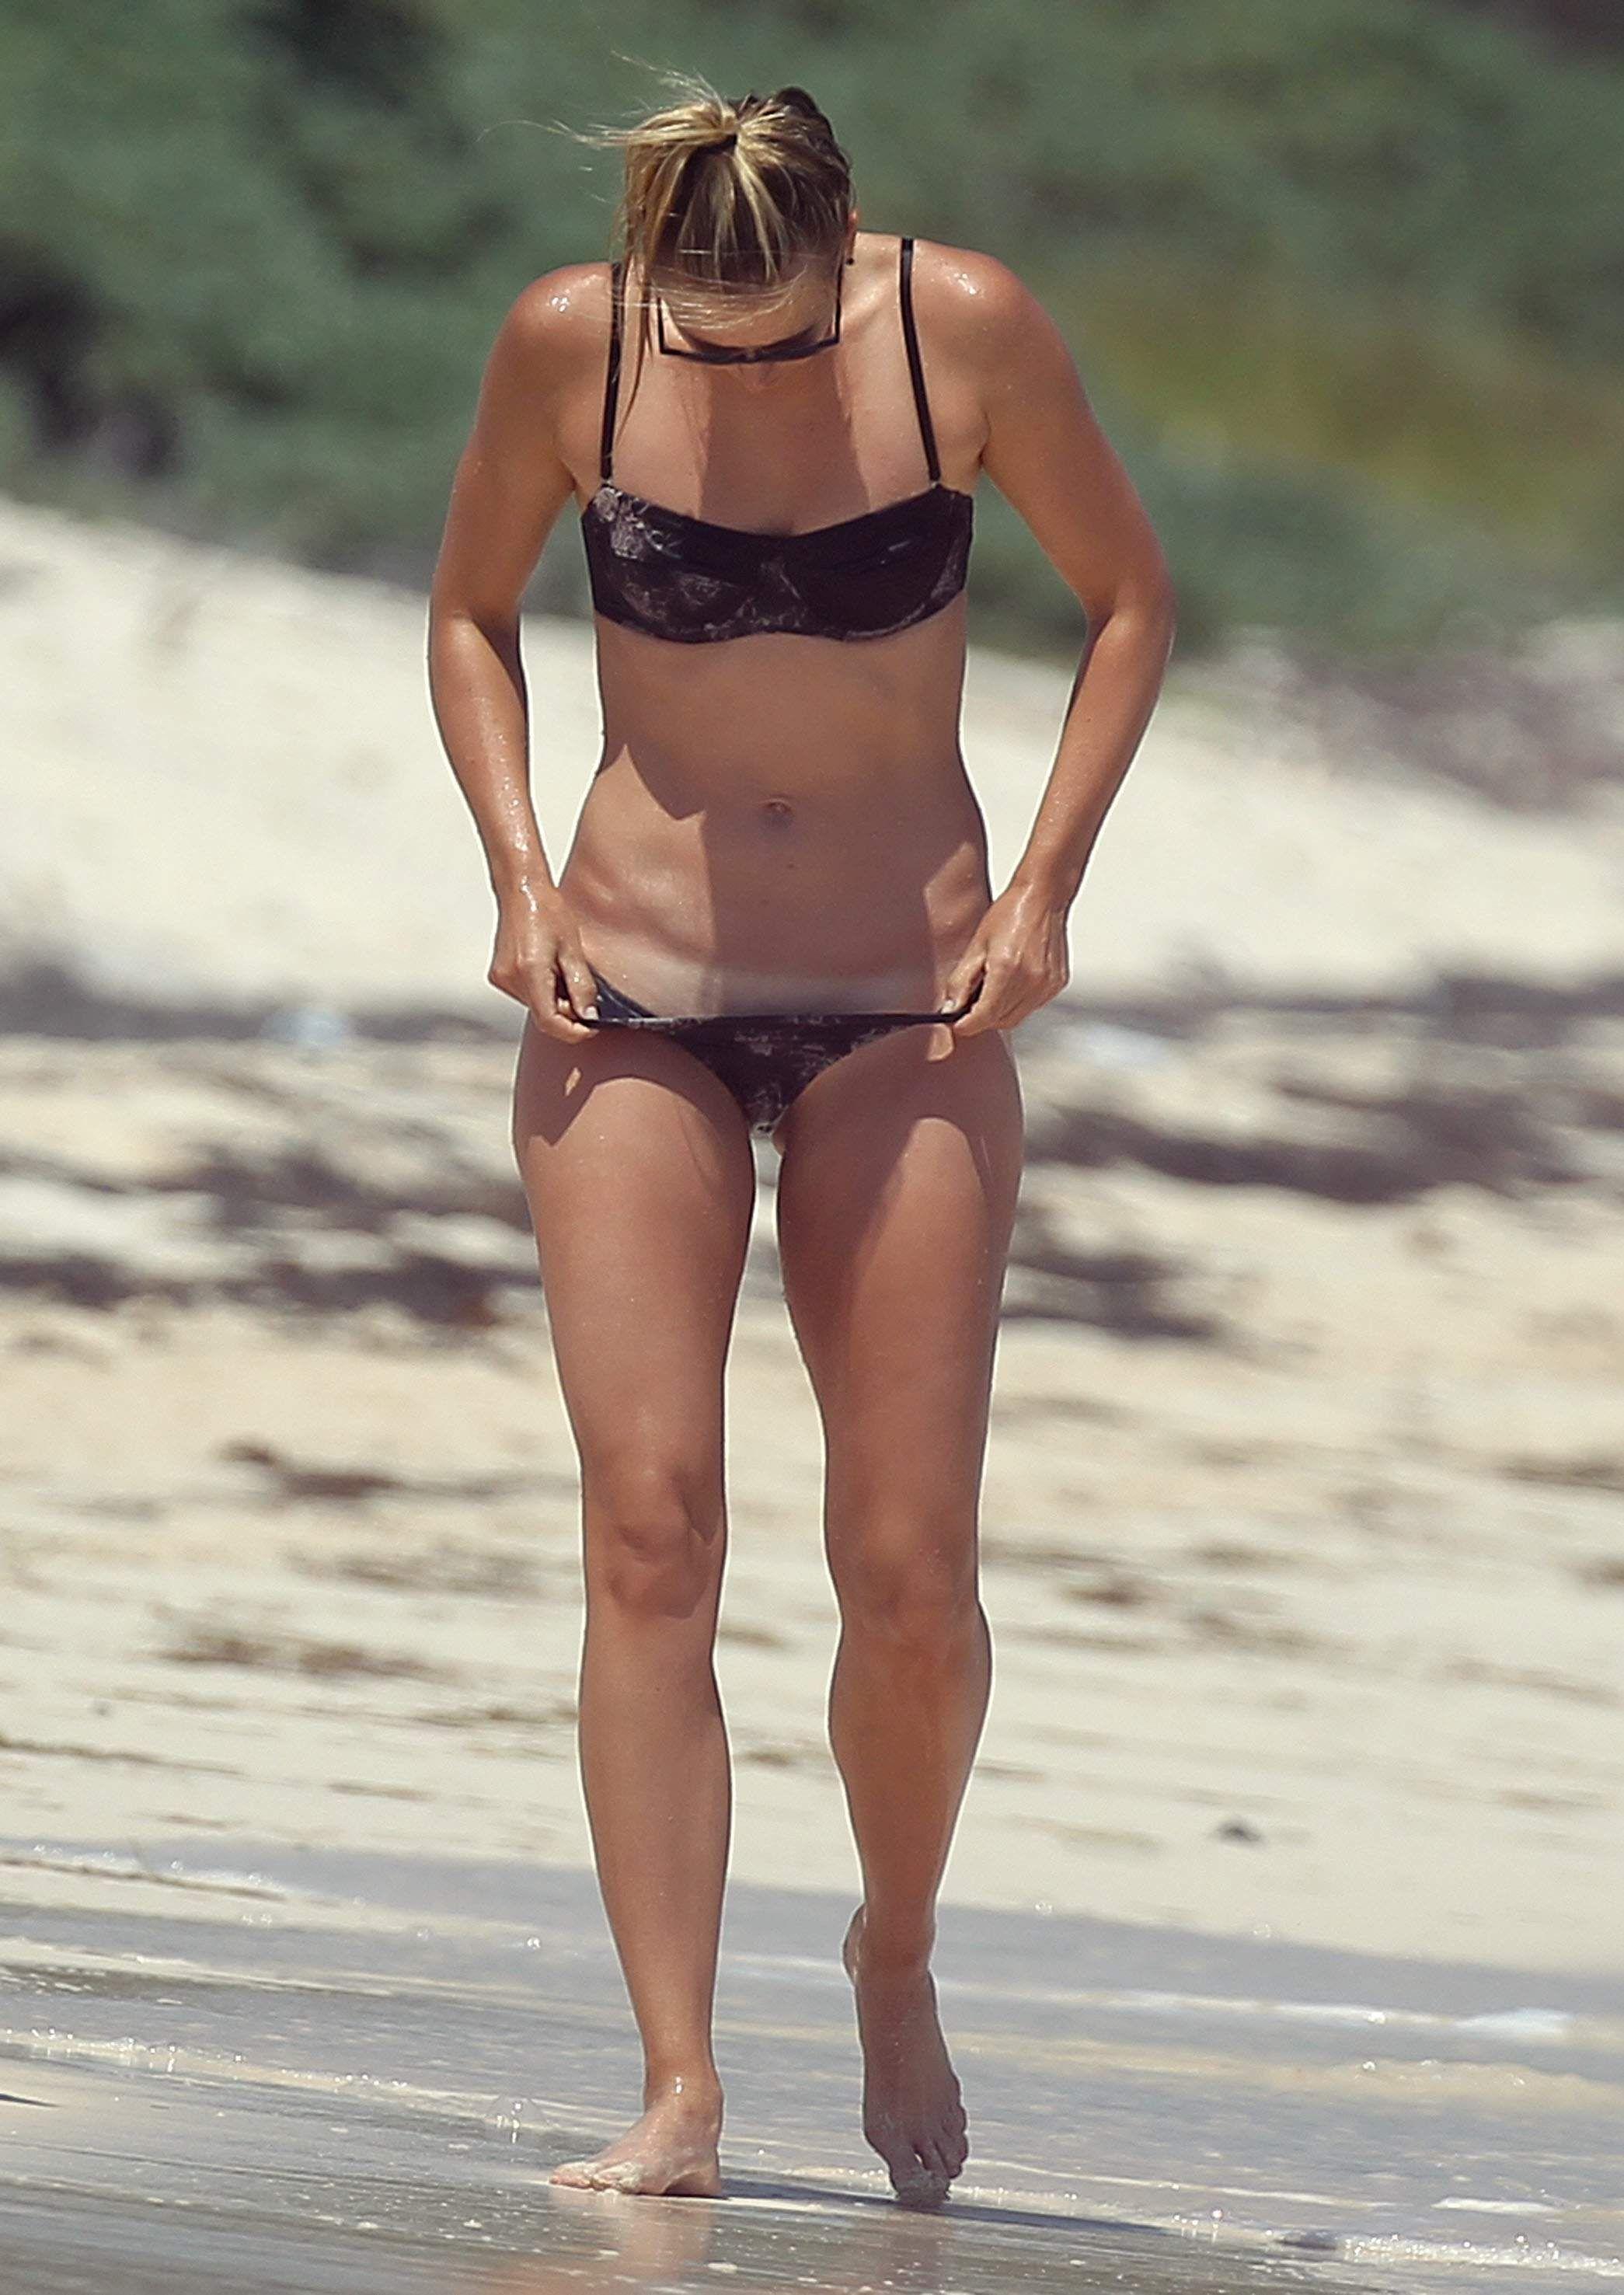 paparazzi Bikini spy sharapova maria photo.jpg